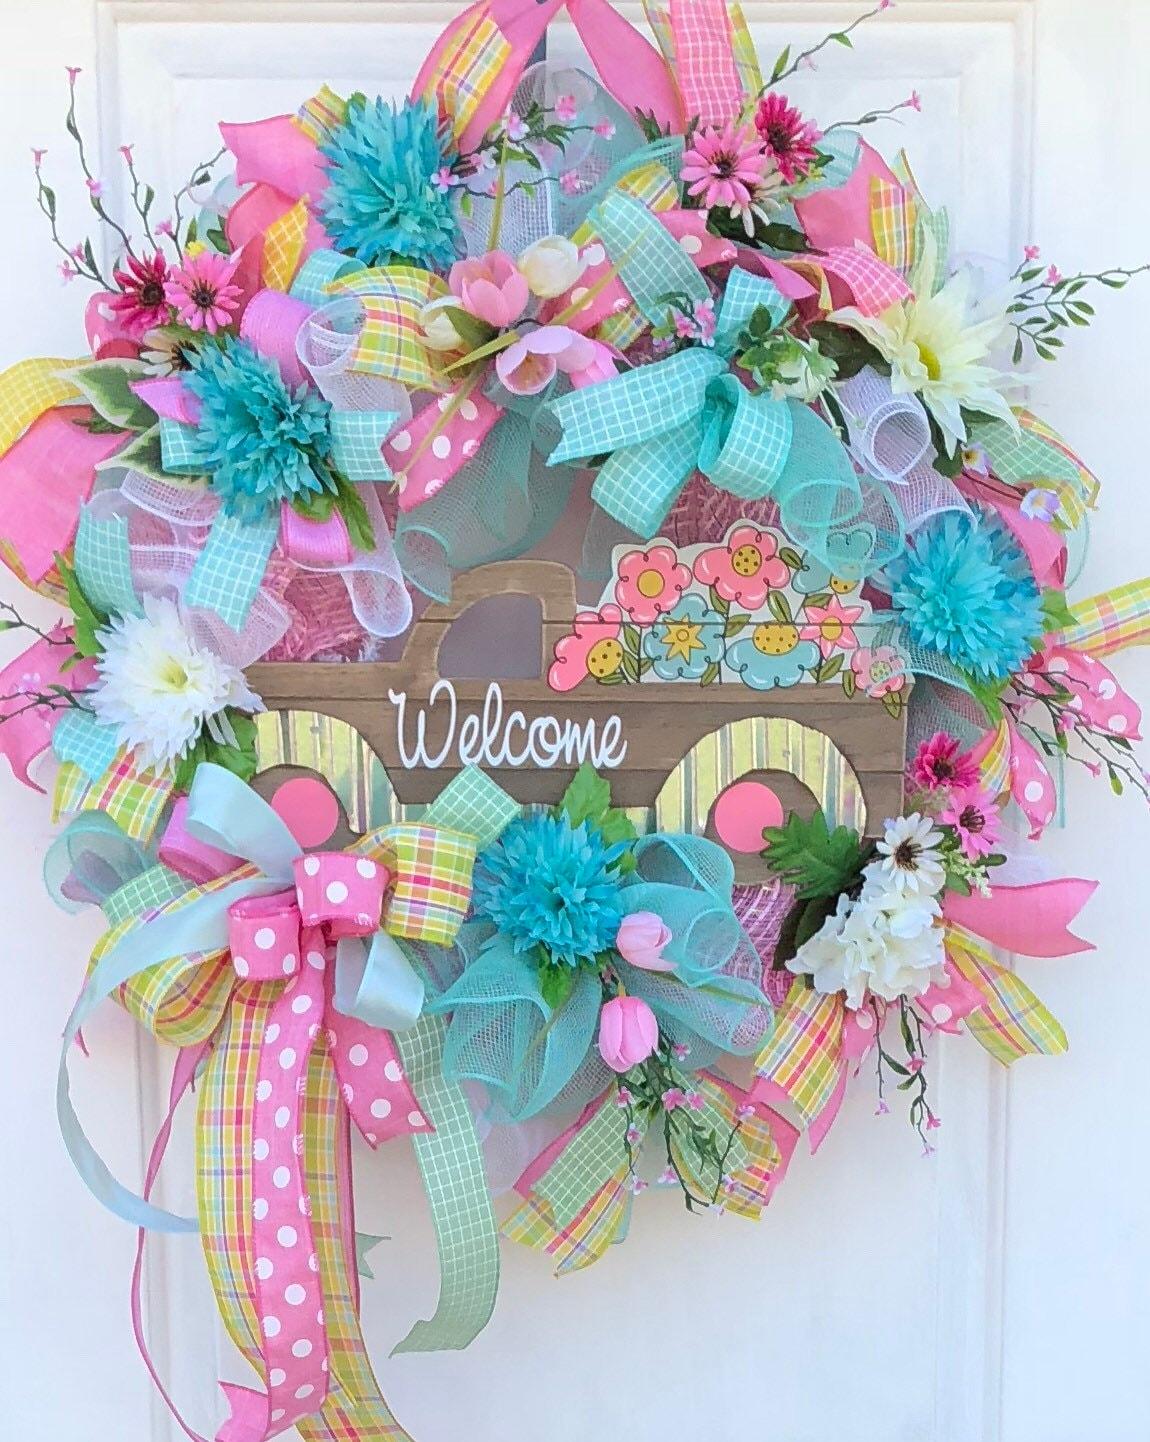 Spring wreath sassy door wreath welcome wreath spring door spring wreath sassy door wreath welcome wreath spring door wreath front door wreath wreaths pink truck wreath rubansaba